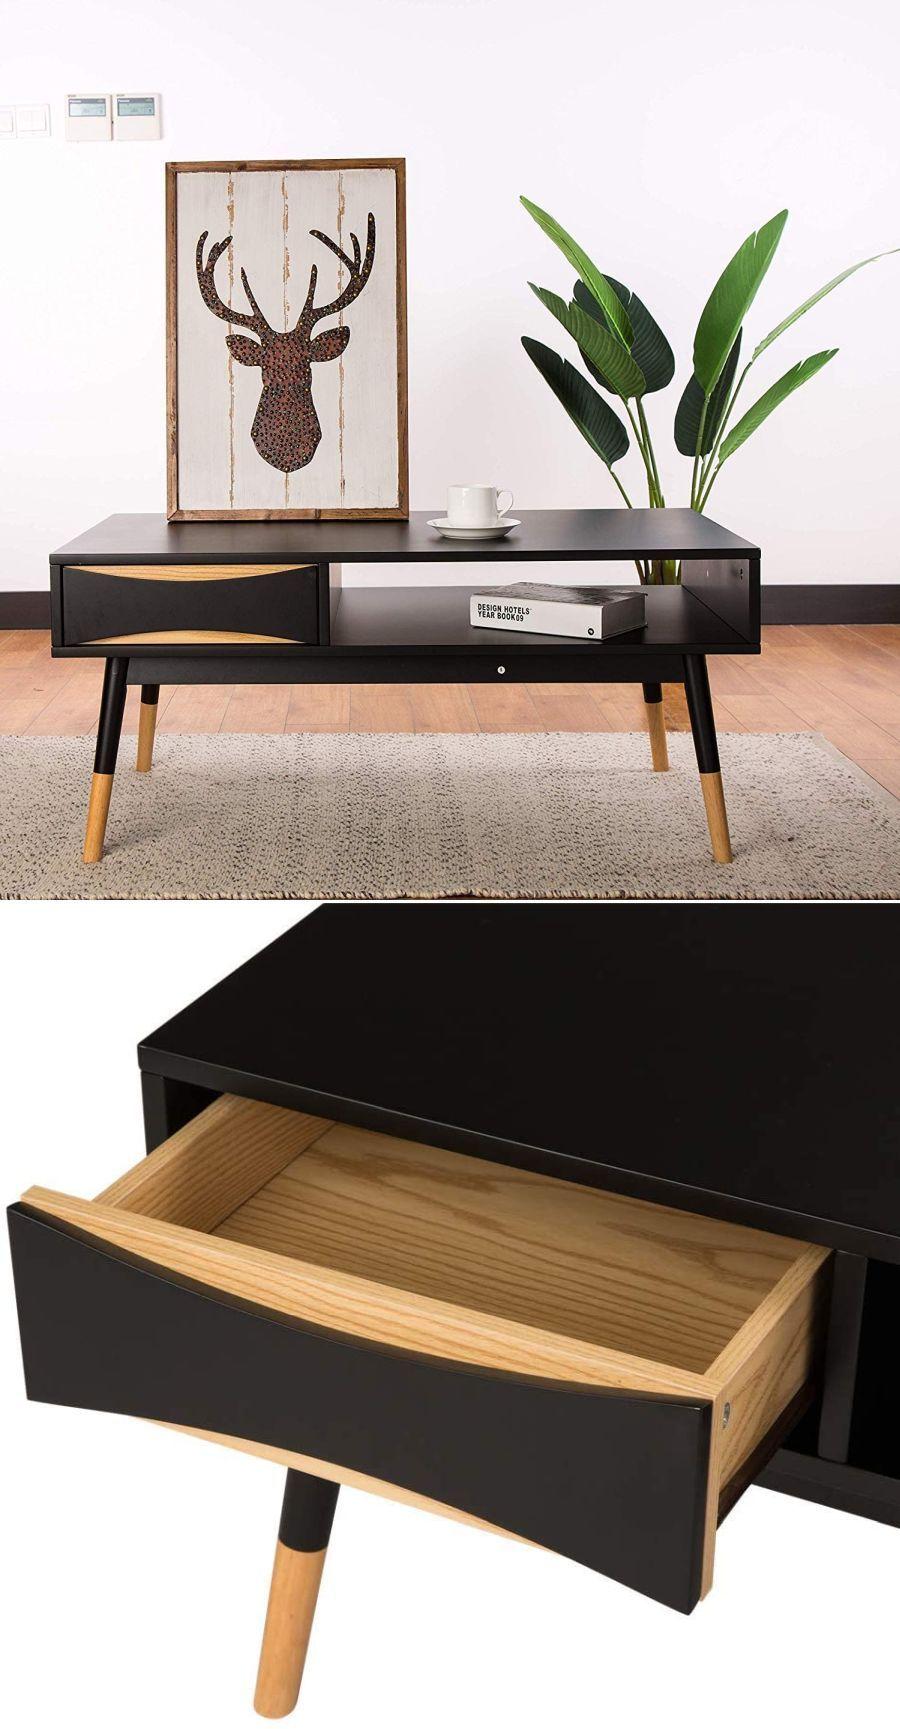 Modern Oslo Black Coffee Table In 2020 Coffee Table Cool Coffee Tables Coffee Table With Storage [ 1729 x 900 Pixel ]